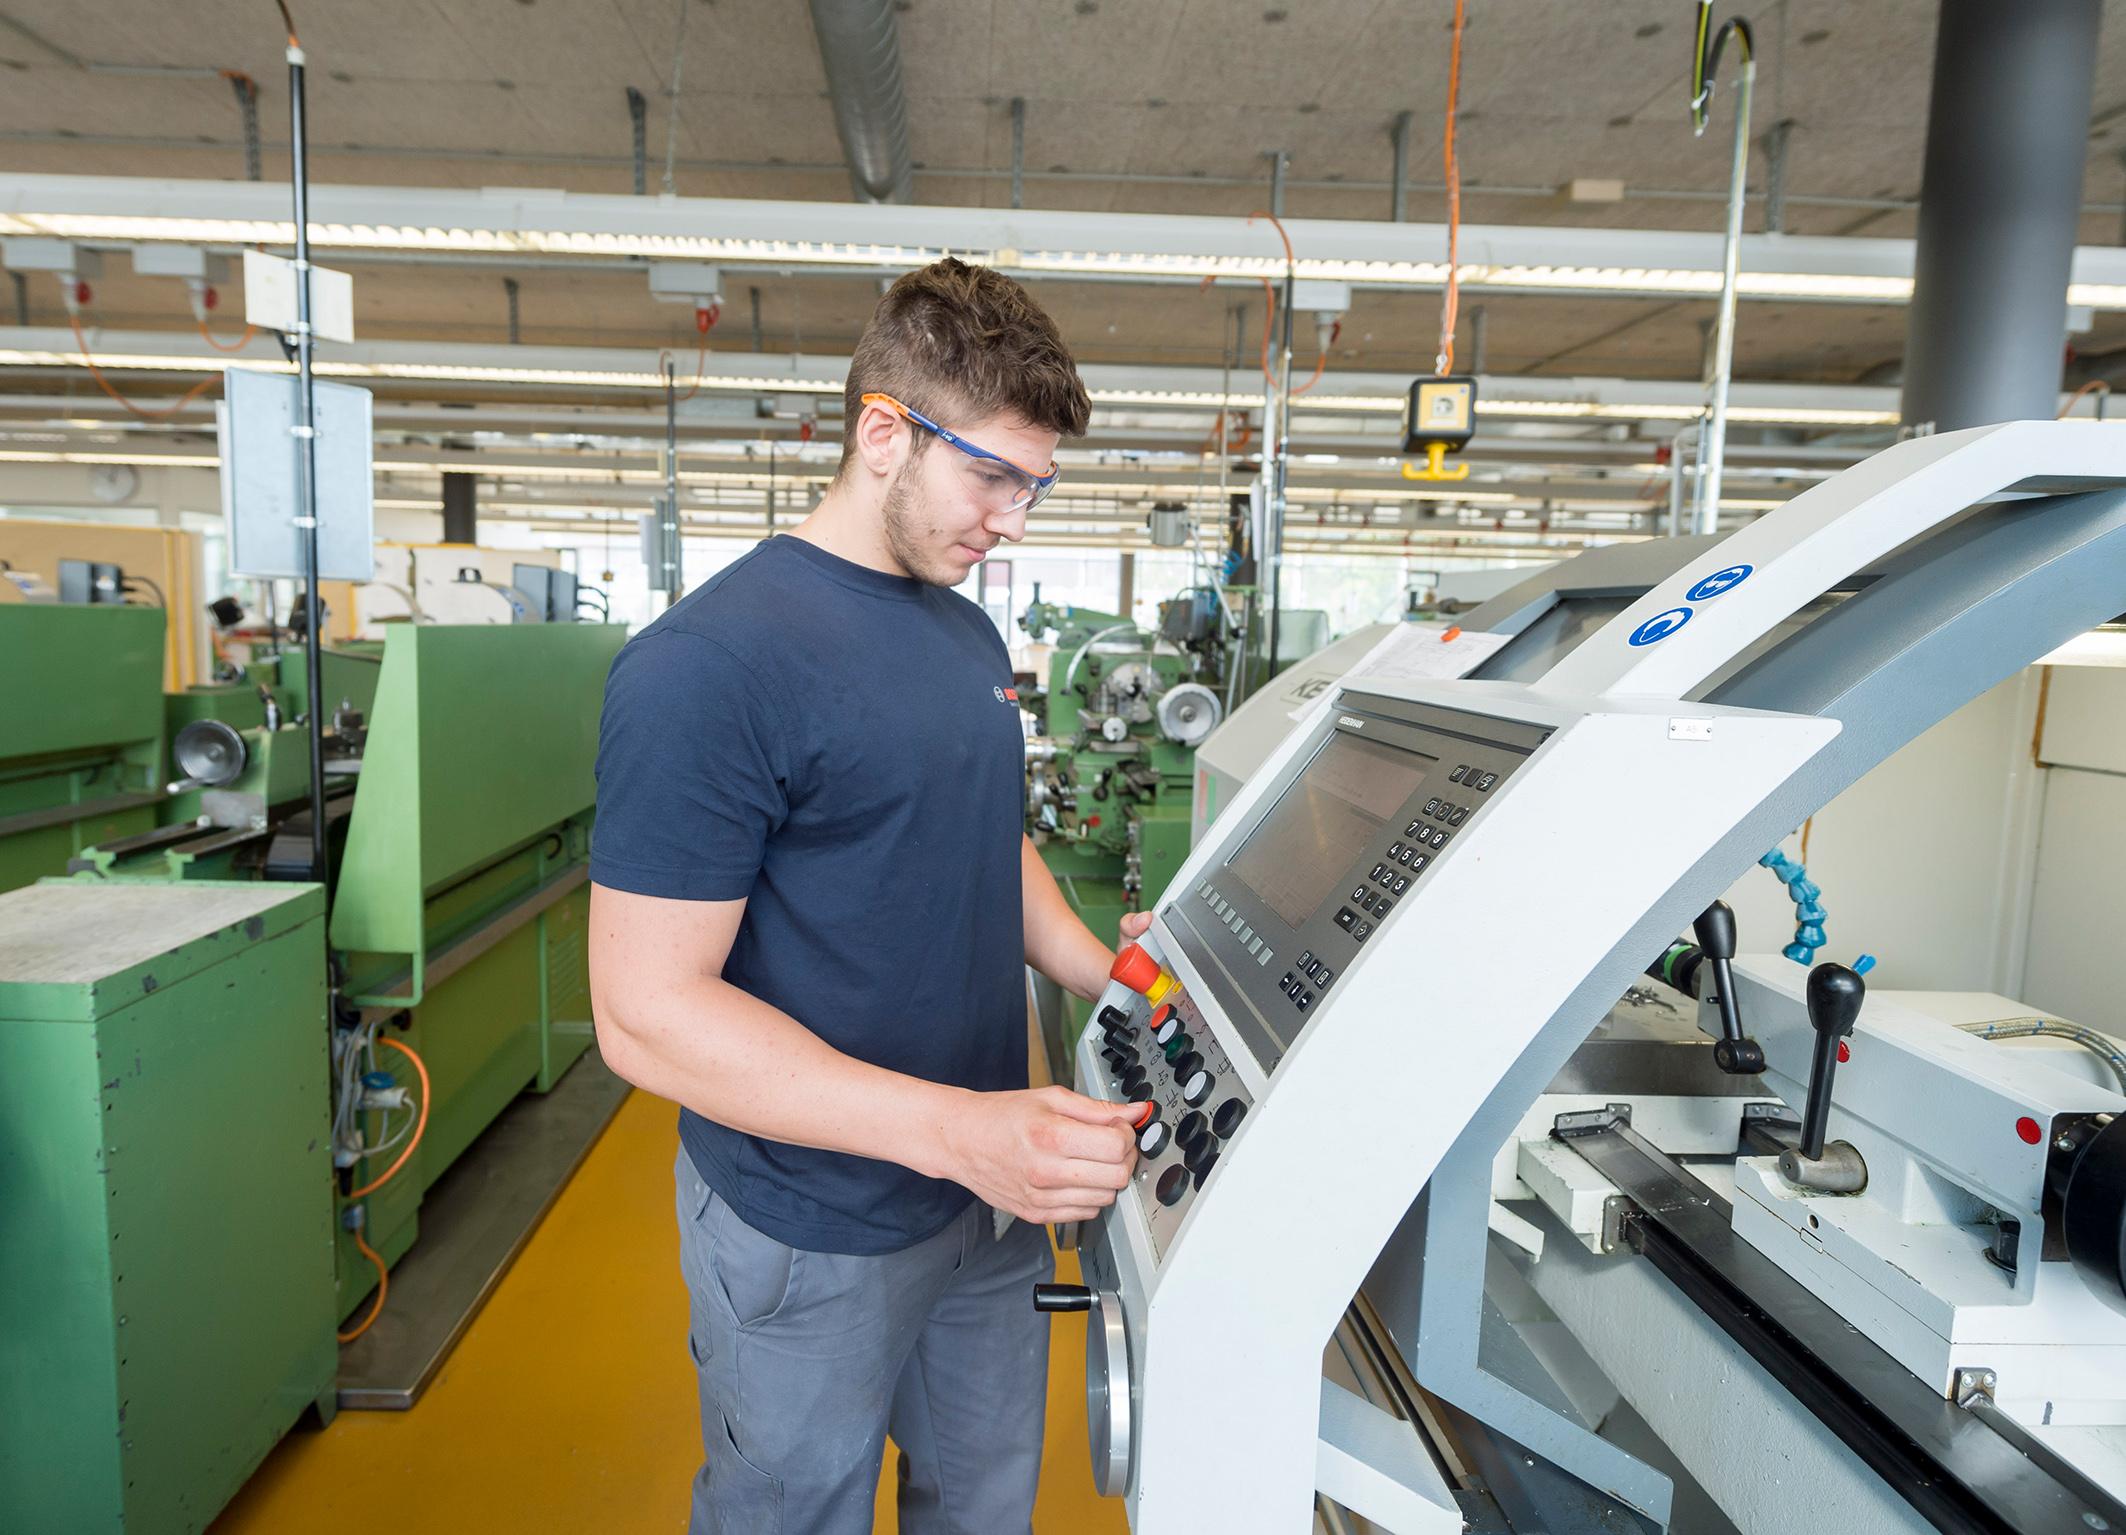 Apprenticeships – expertise for Industry 4.0